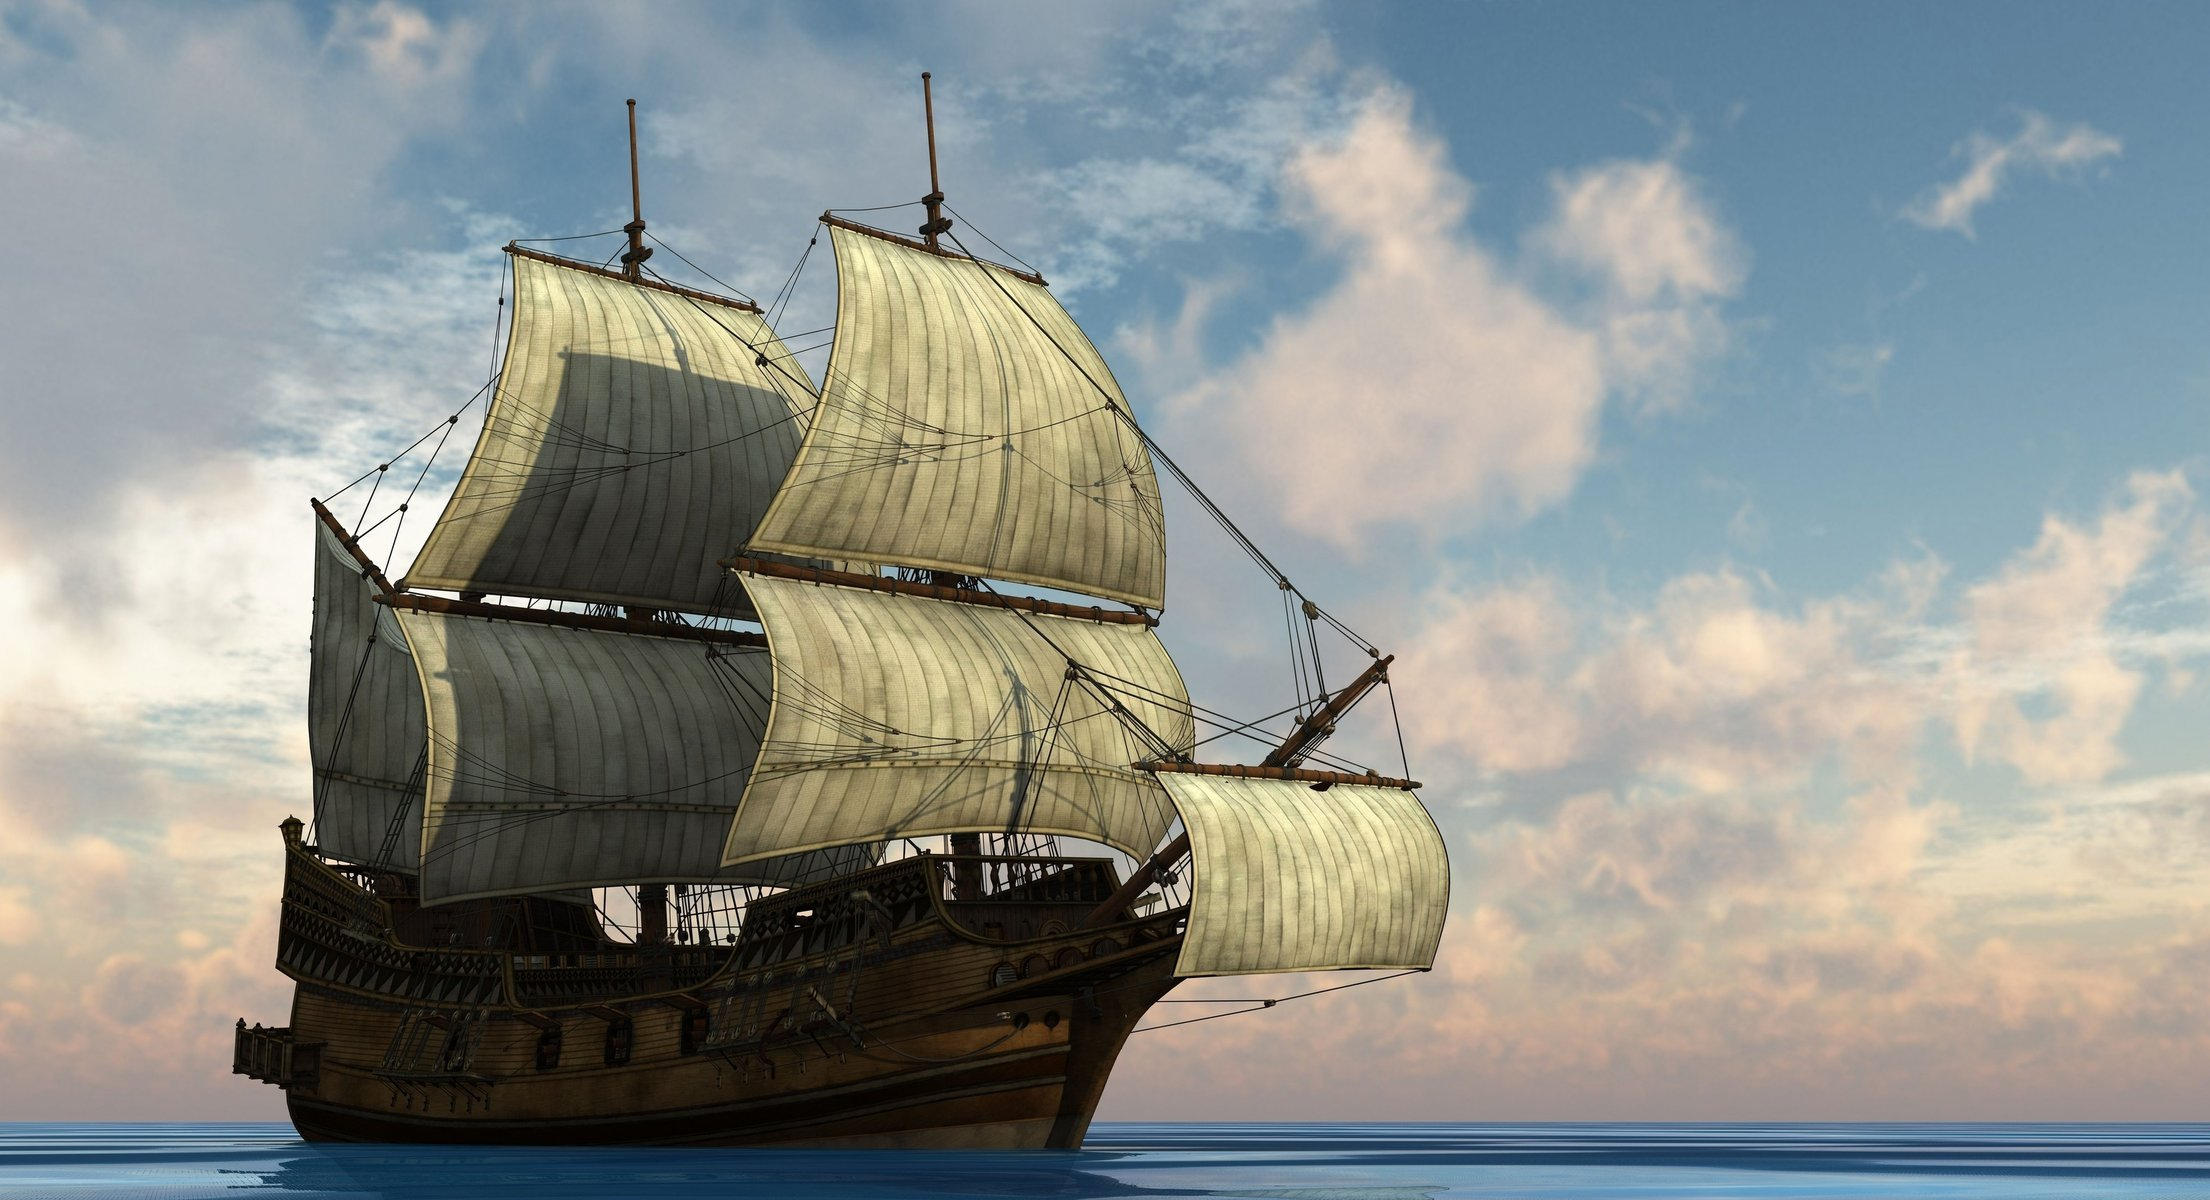 Гиф, картинки фрегаты в море